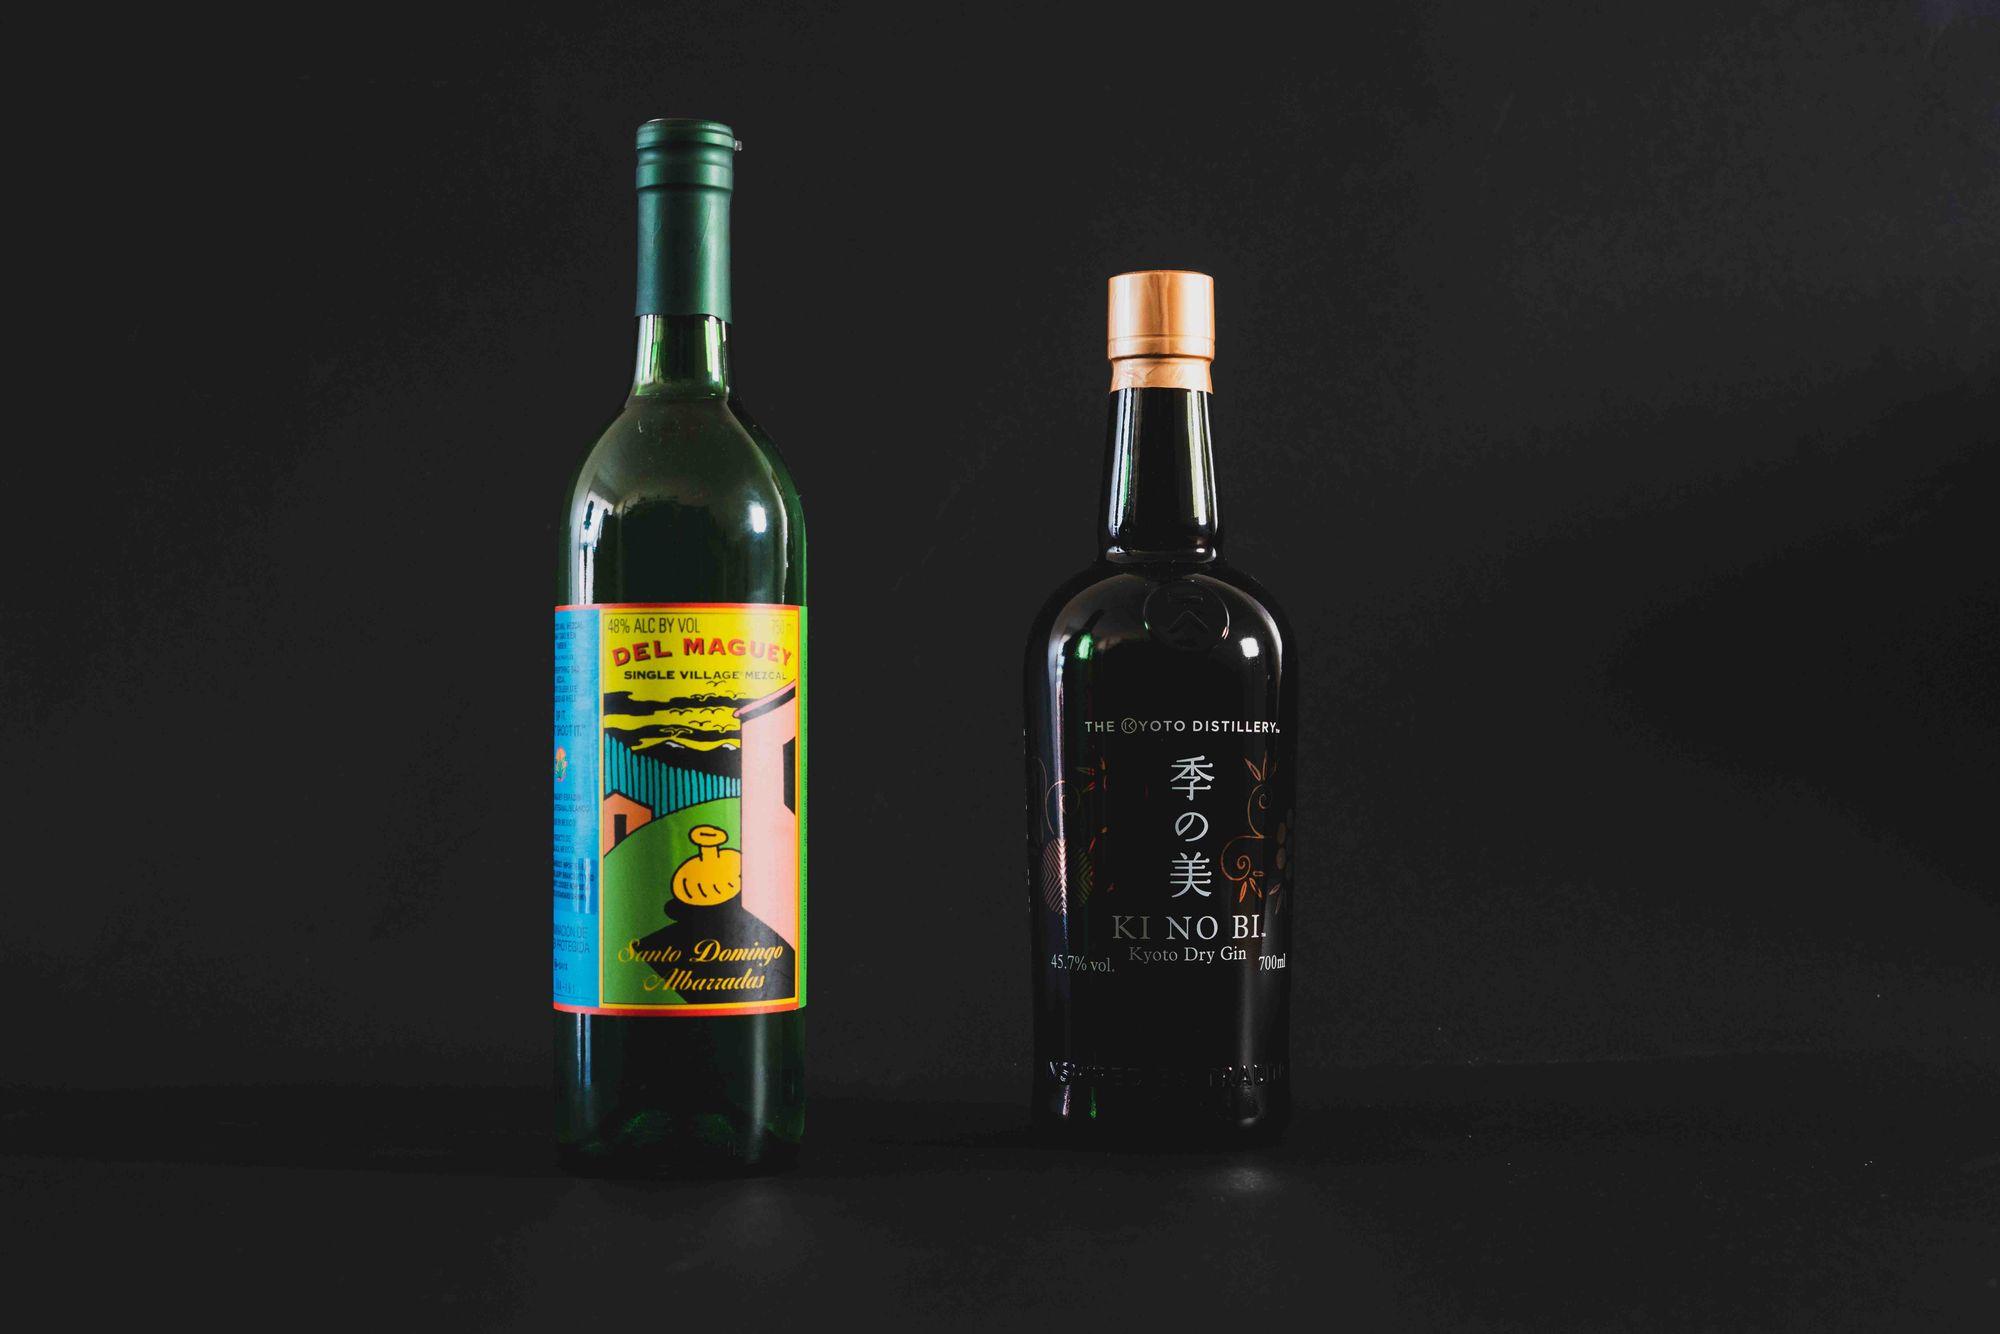 Del Maguey Santo Domingo Albarradas and Ki No Bi Kyoto Dry Gin. Photo: Boothby